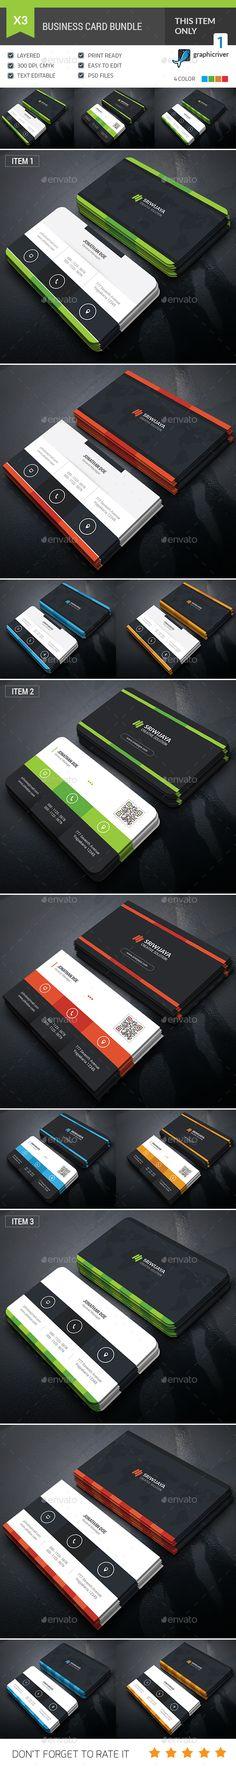 Professional Business Card Bundle - Template PSD